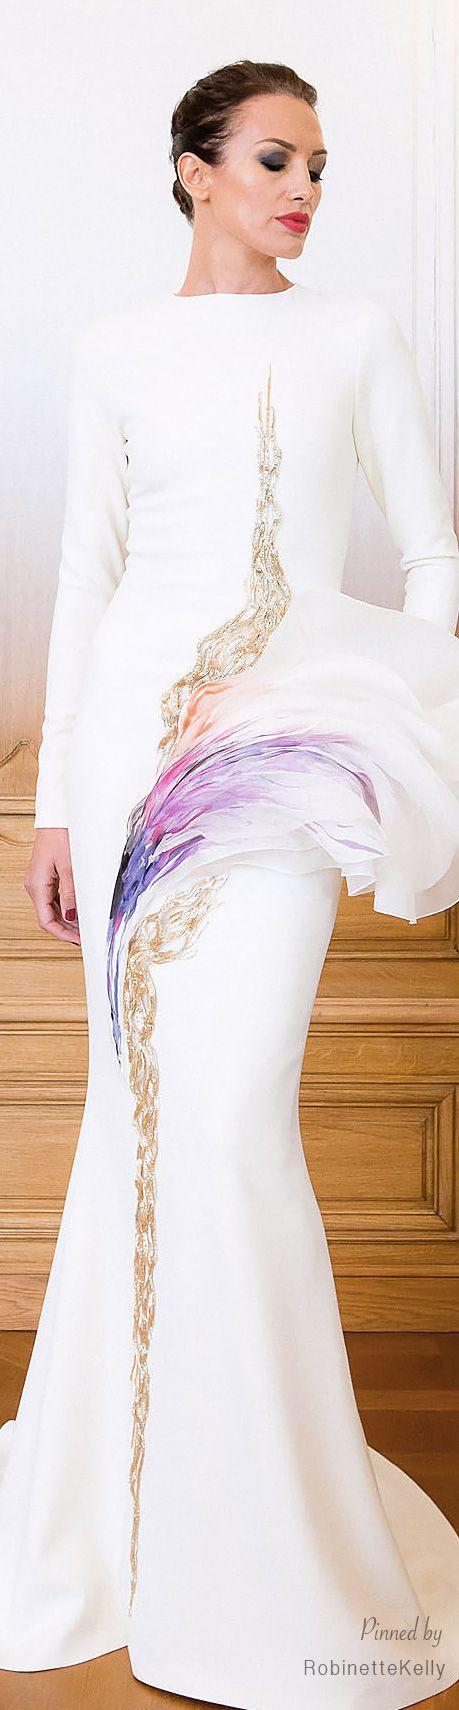 Stephane Rolland Haute Couture | F/W 2014-15 §